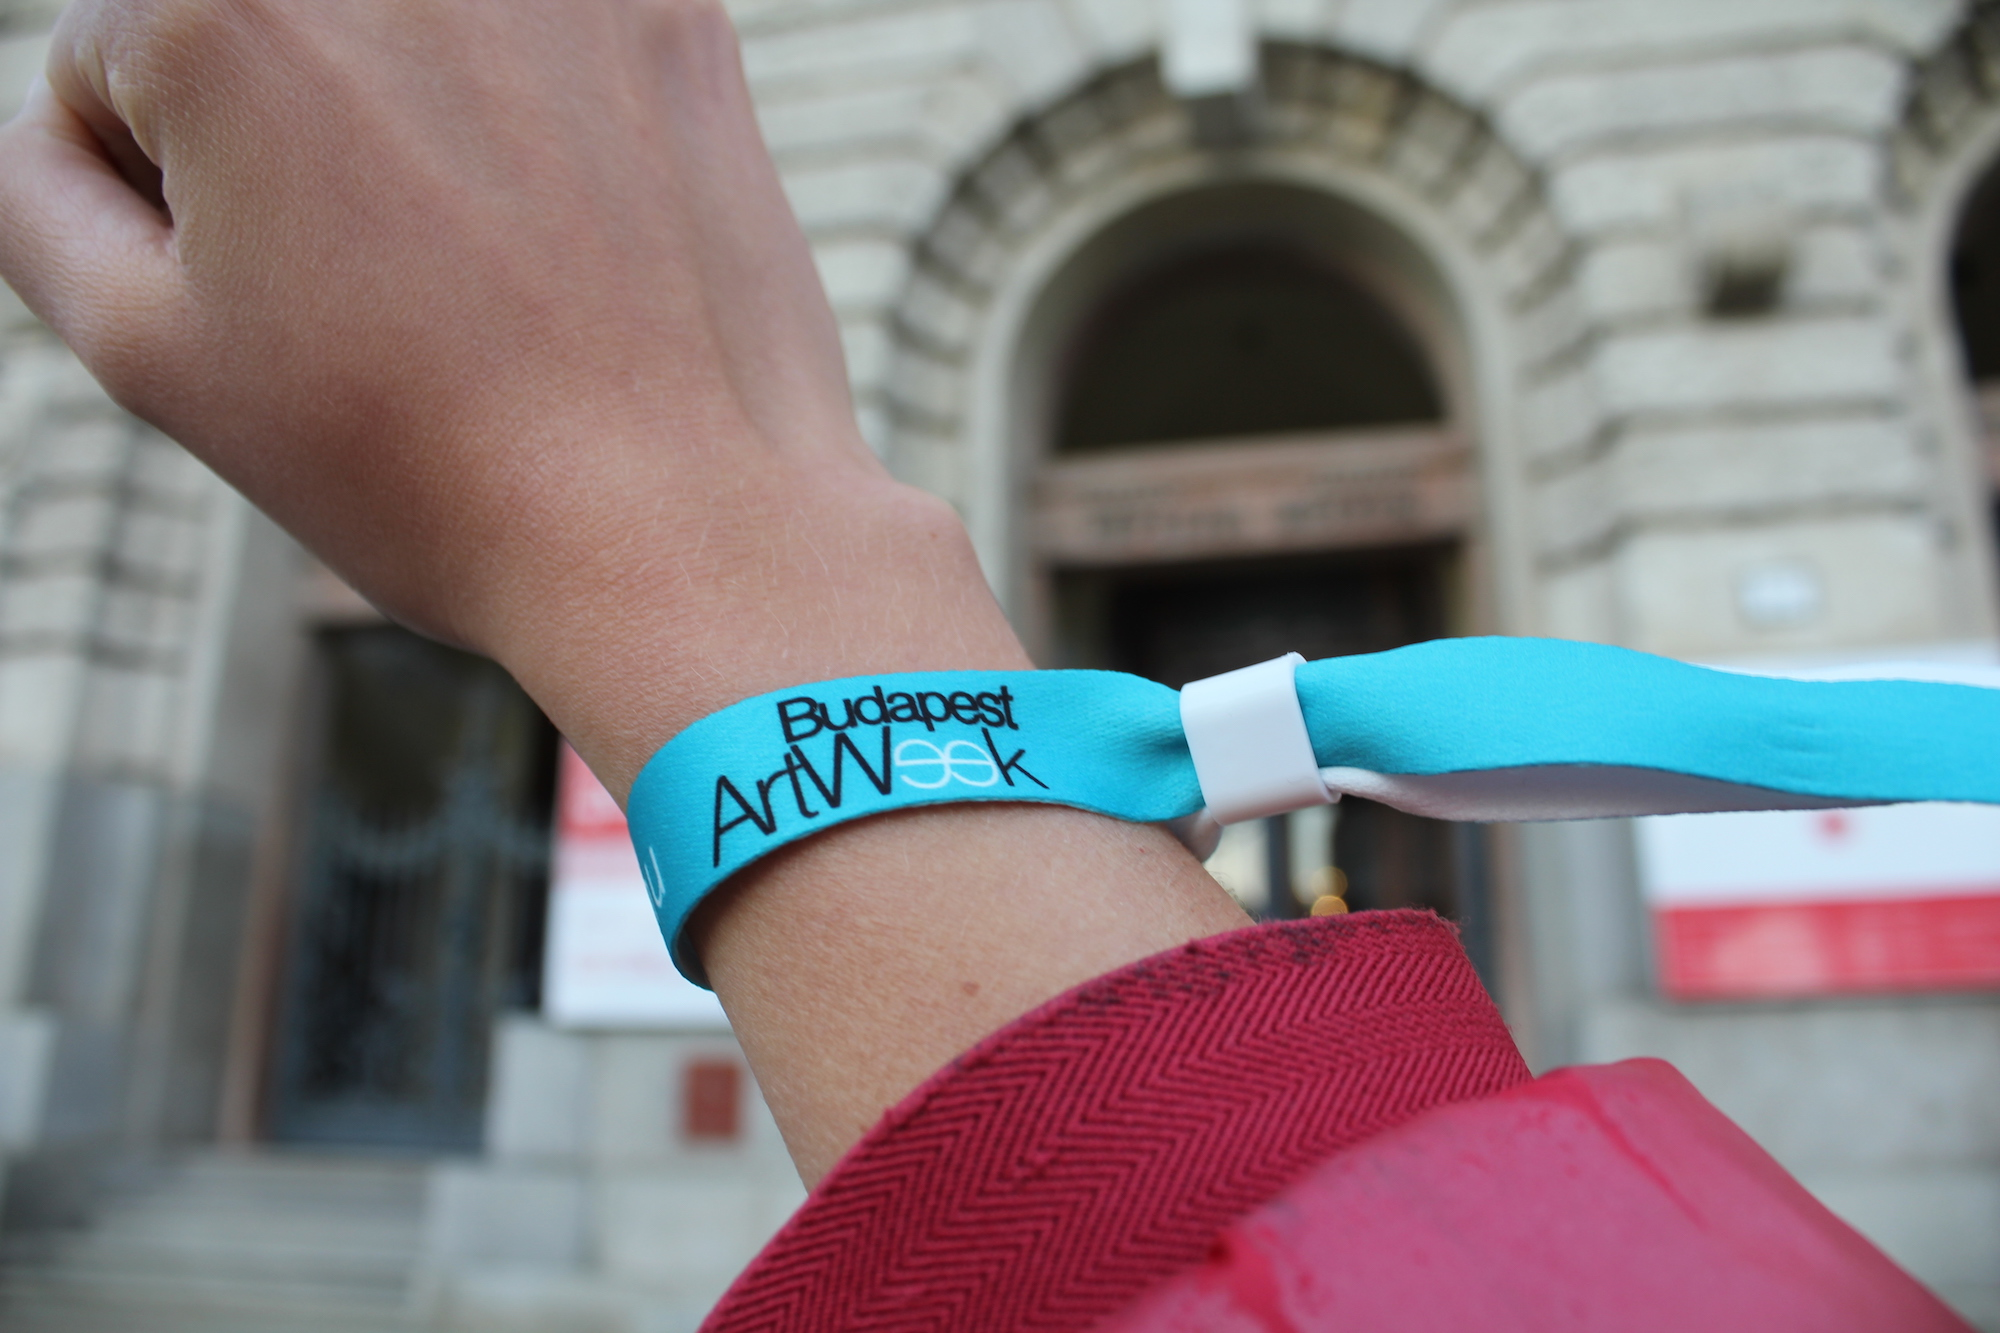 BudapestArtWeek 2016 wristband